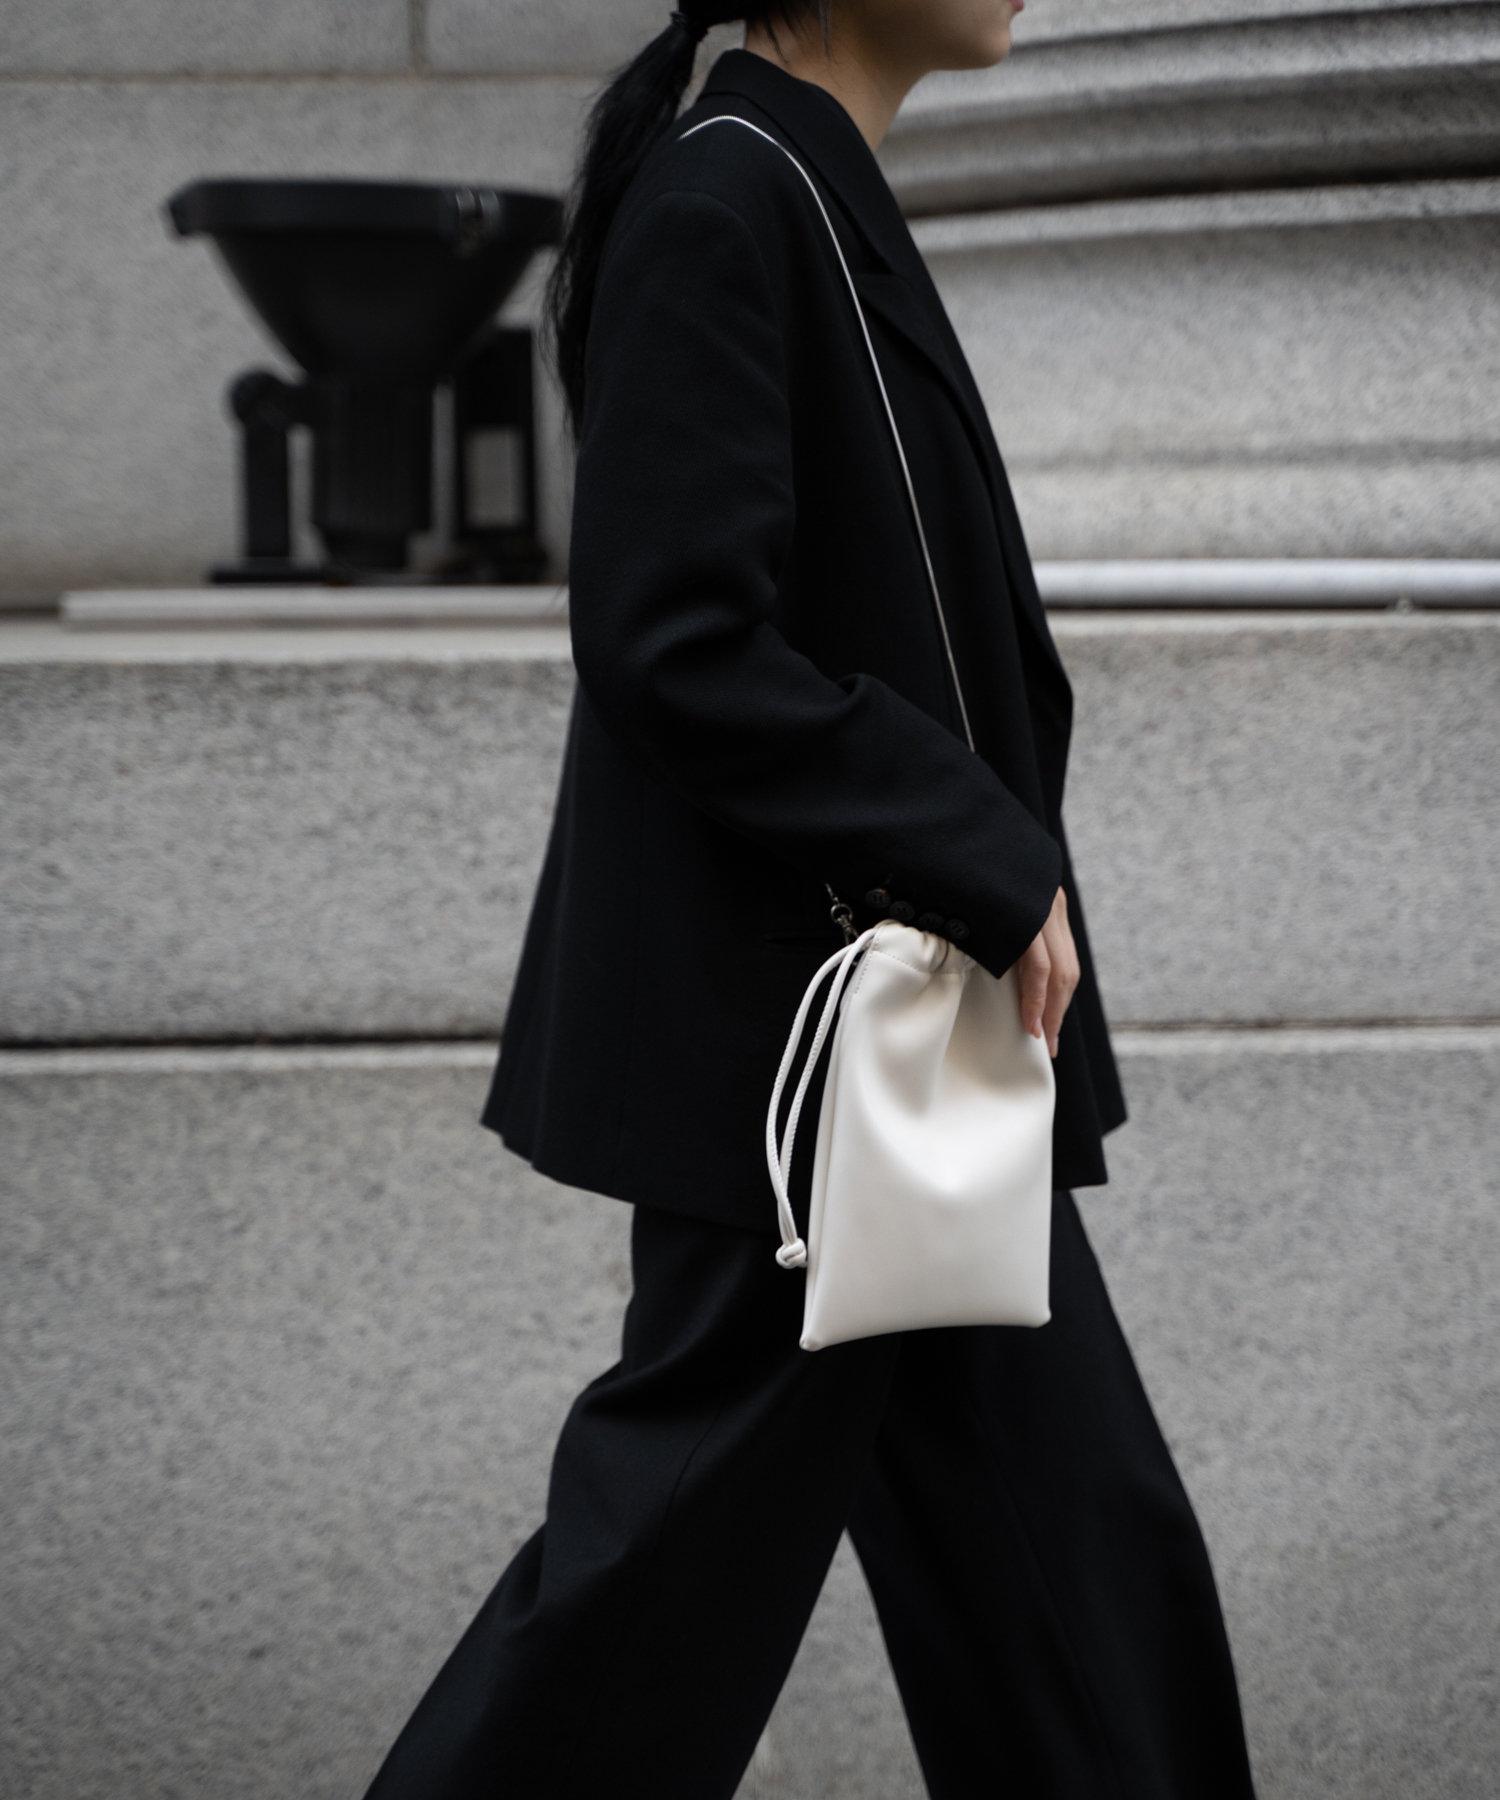 COLONY 2139(コロニー トゥーワンスリーナイン) レディース 【@sakina_yamamoto】サステナビリティレザー巾着チェーンバッグ アイボリー